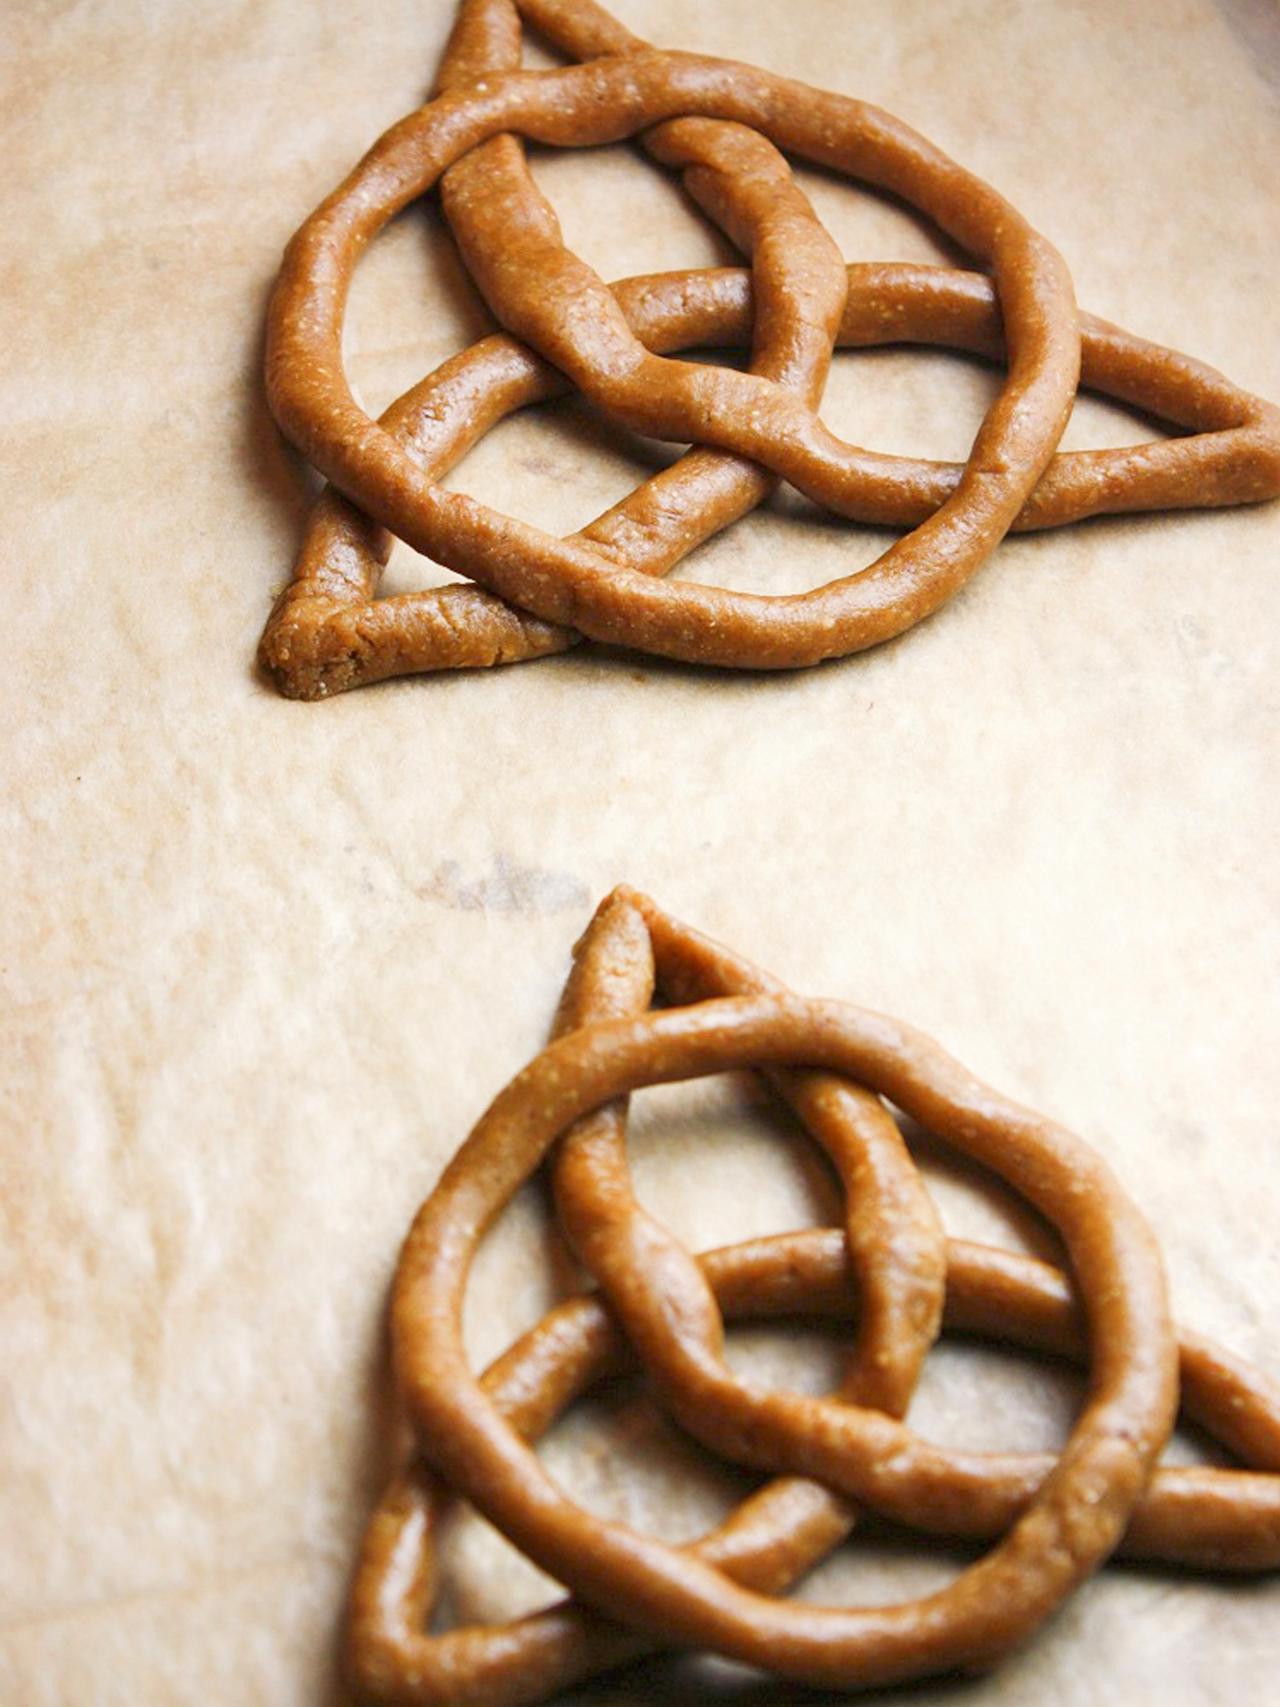 Celtic Knot Cookies Recipe Hgtv